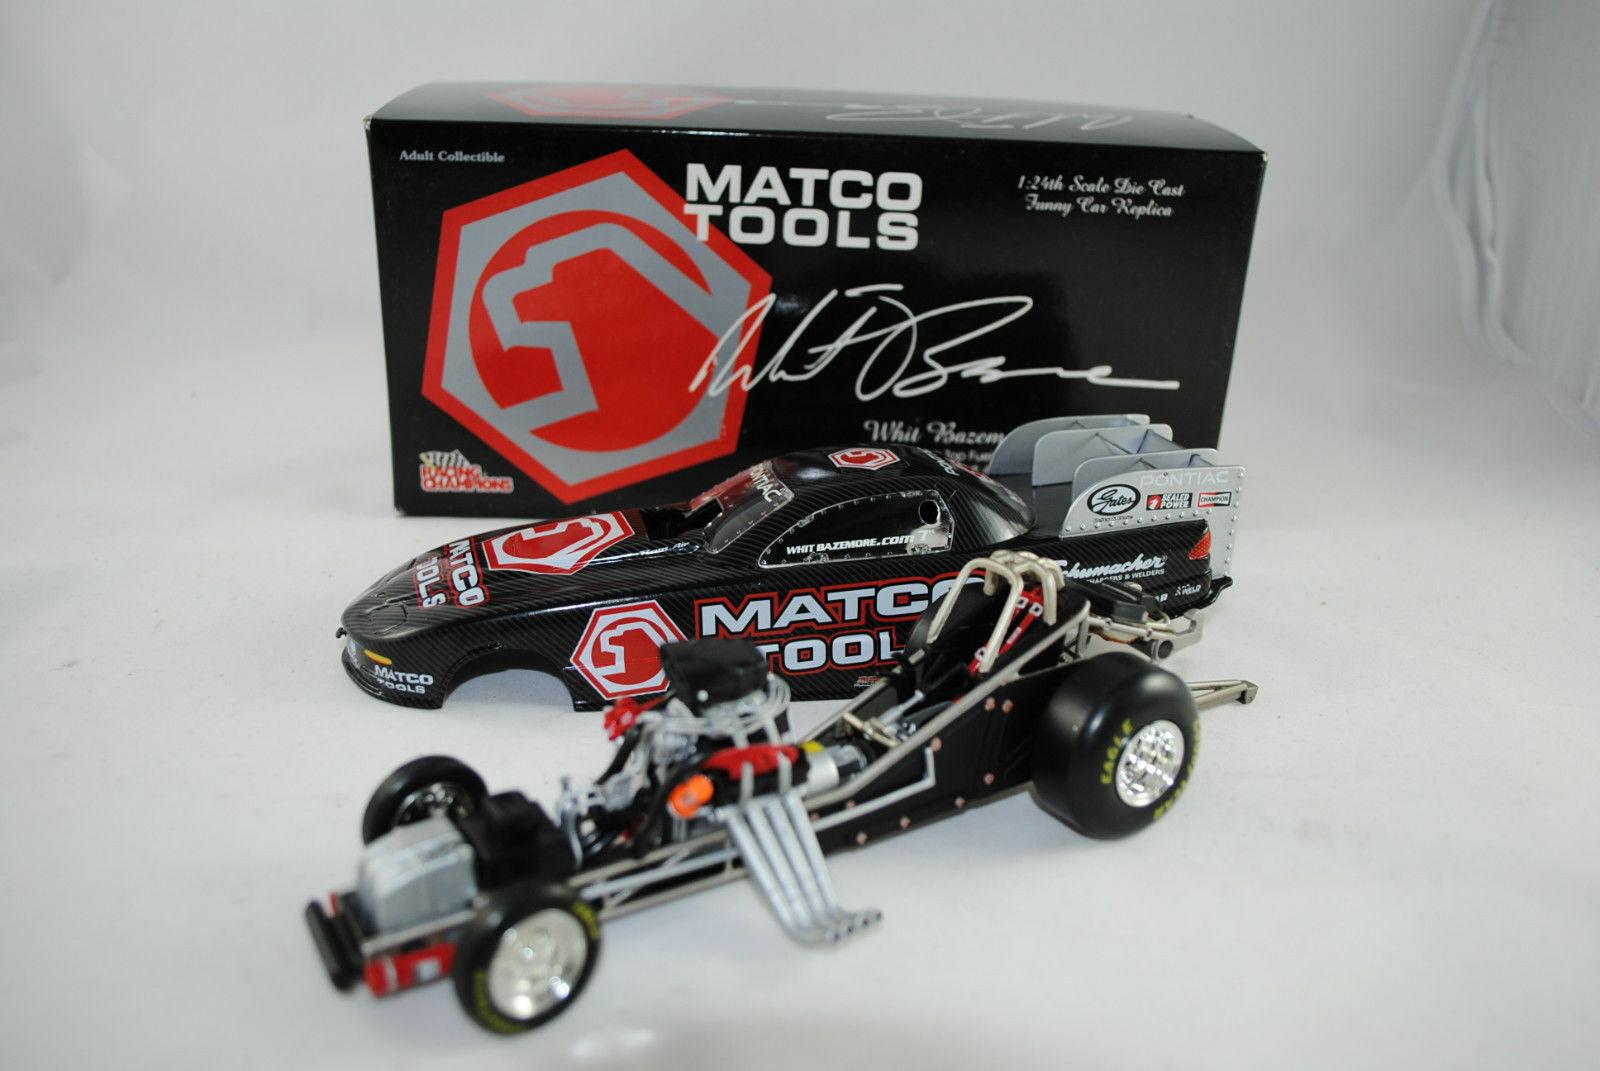 1 24 racing Champions Matco Tools Pontiac Whit Bazemore Limited Editon